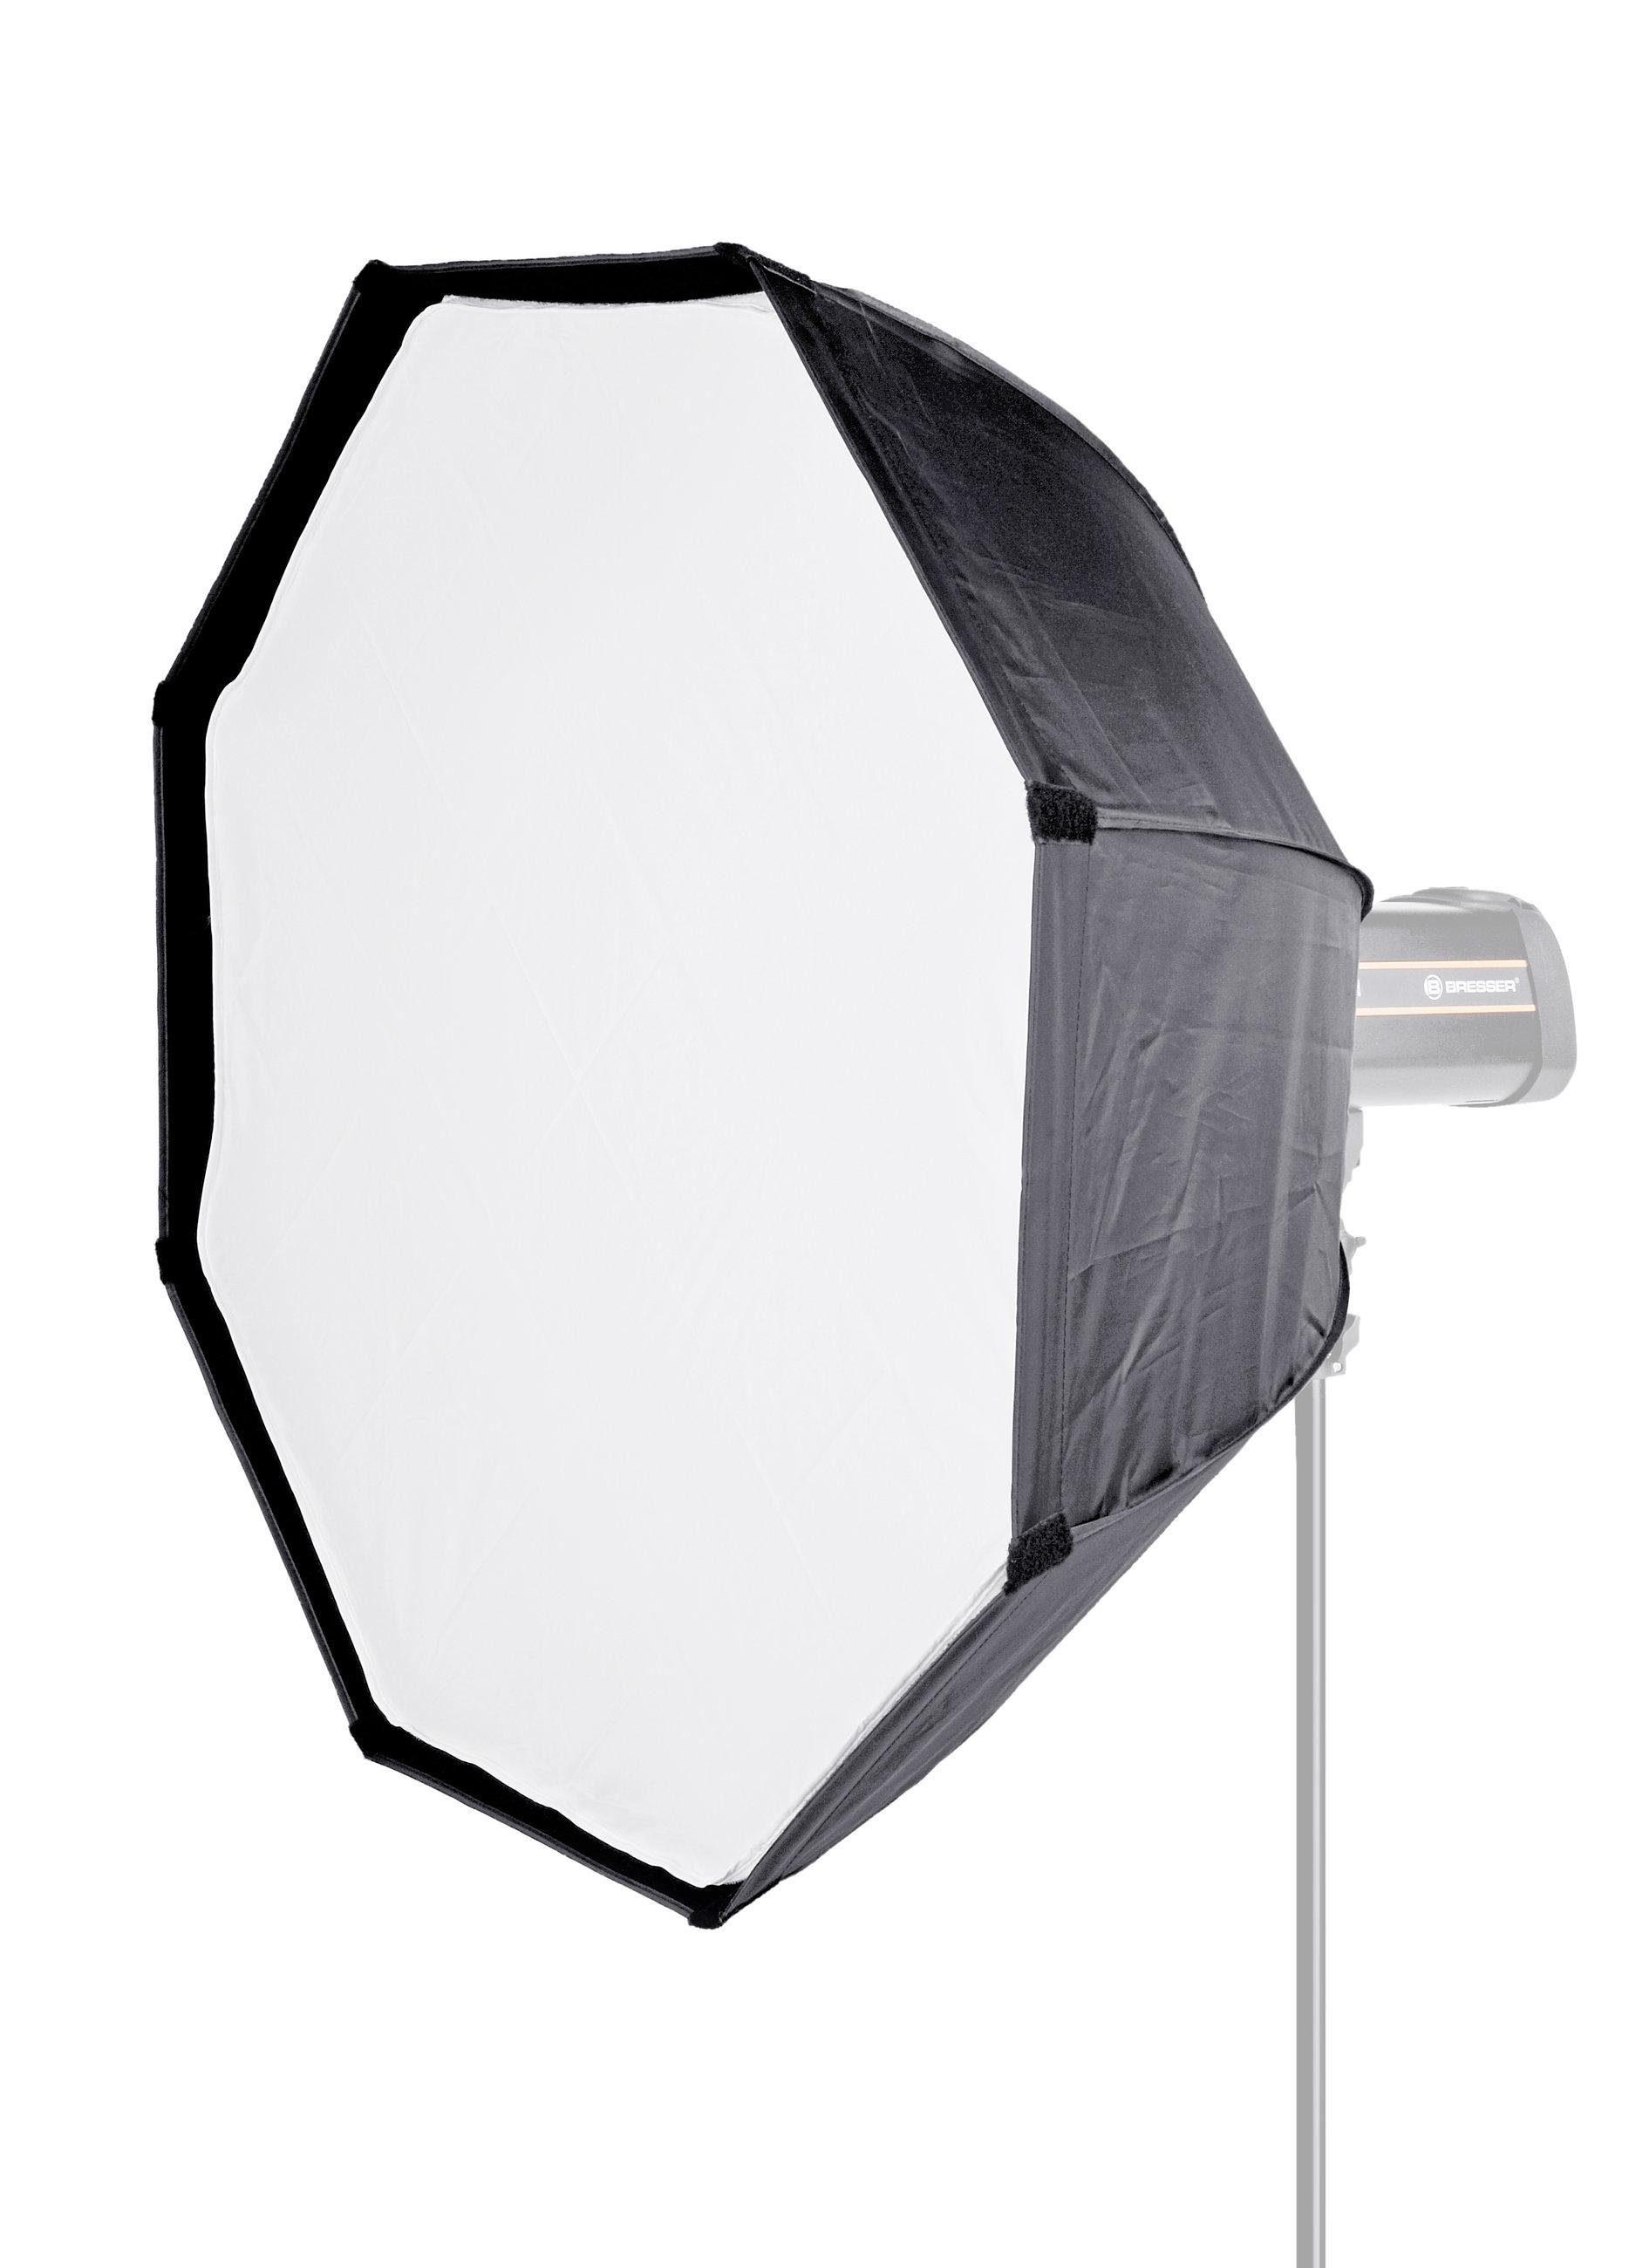 BRESSER Fotostudio »BRESSER SS-7 Octabox High Grade 120cm mit Wabengit«